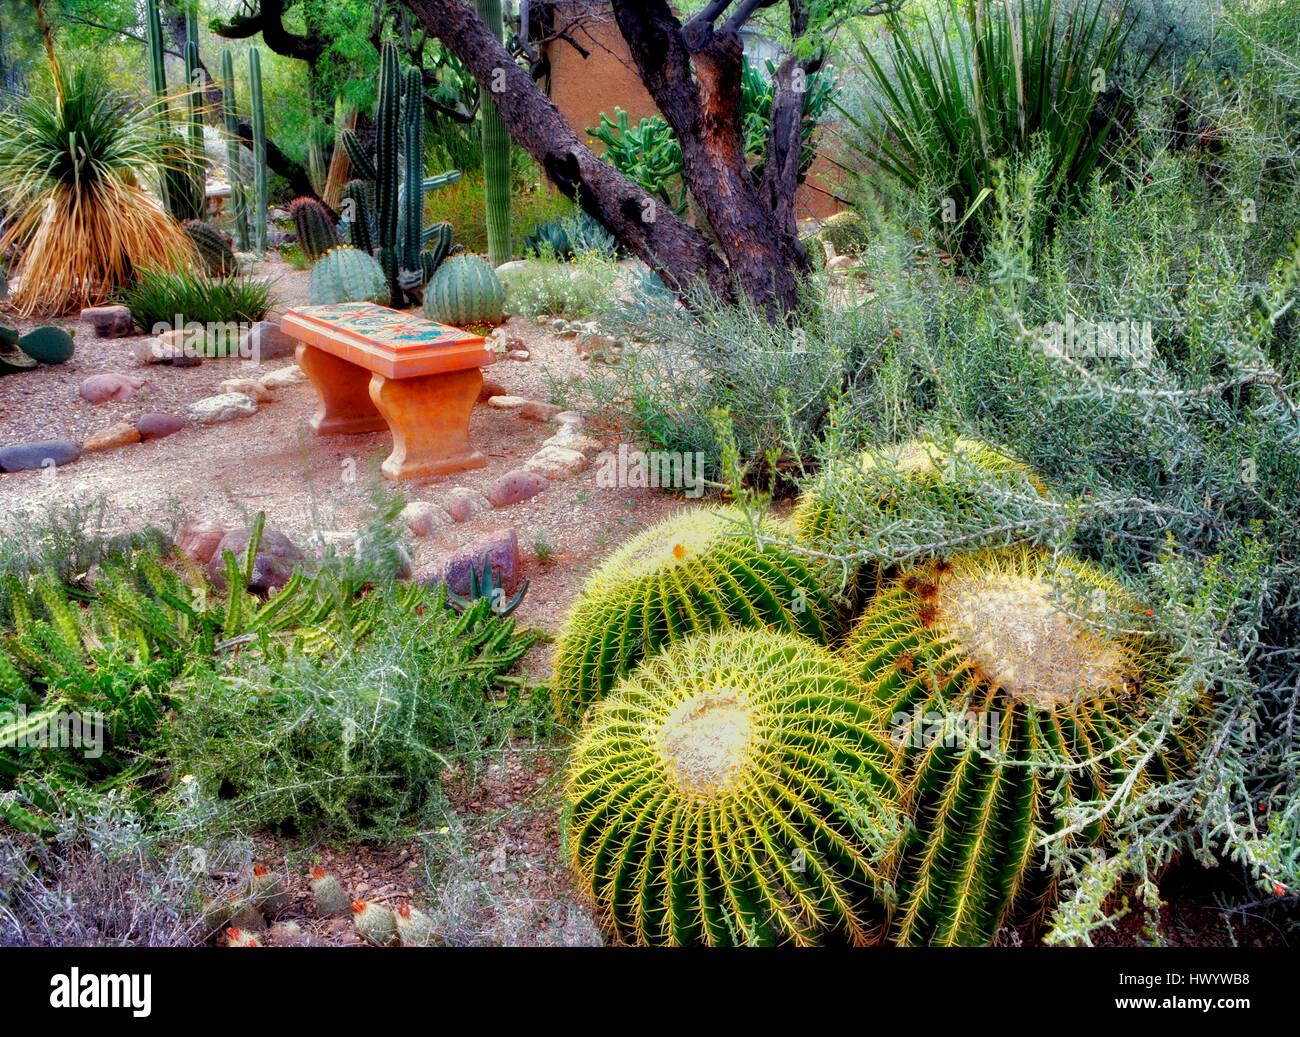 Ordinaire Cactus Garden With Bench In Tucson Botanical Gardens. Tucson. Arizona